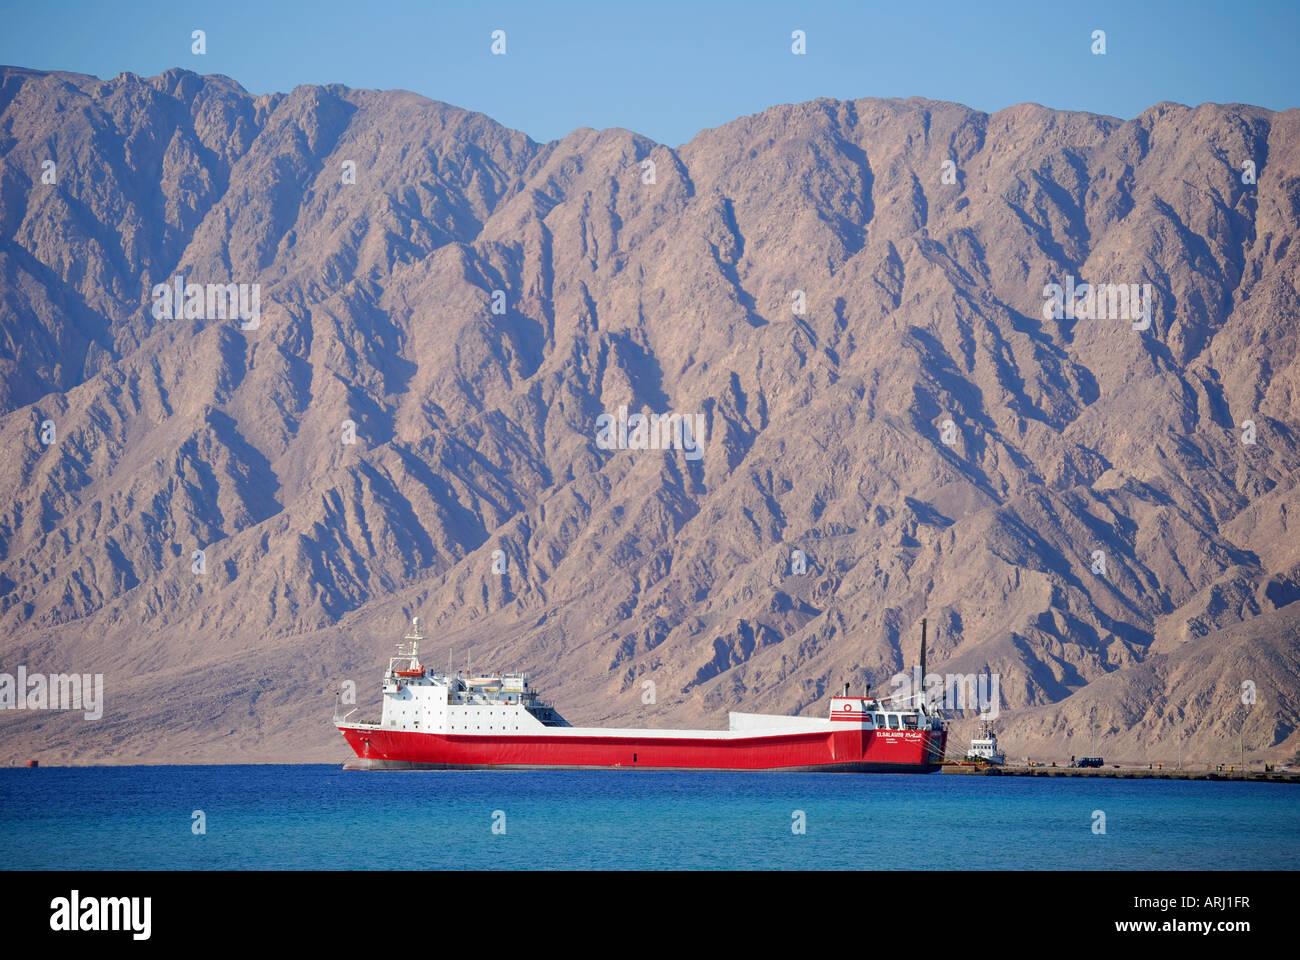 Vehicle and passenger ferry to Saudi Arabia, Nuweiba Port, Nuweiba, Sinai Peninsula, Republic of Egypt - Stock Image